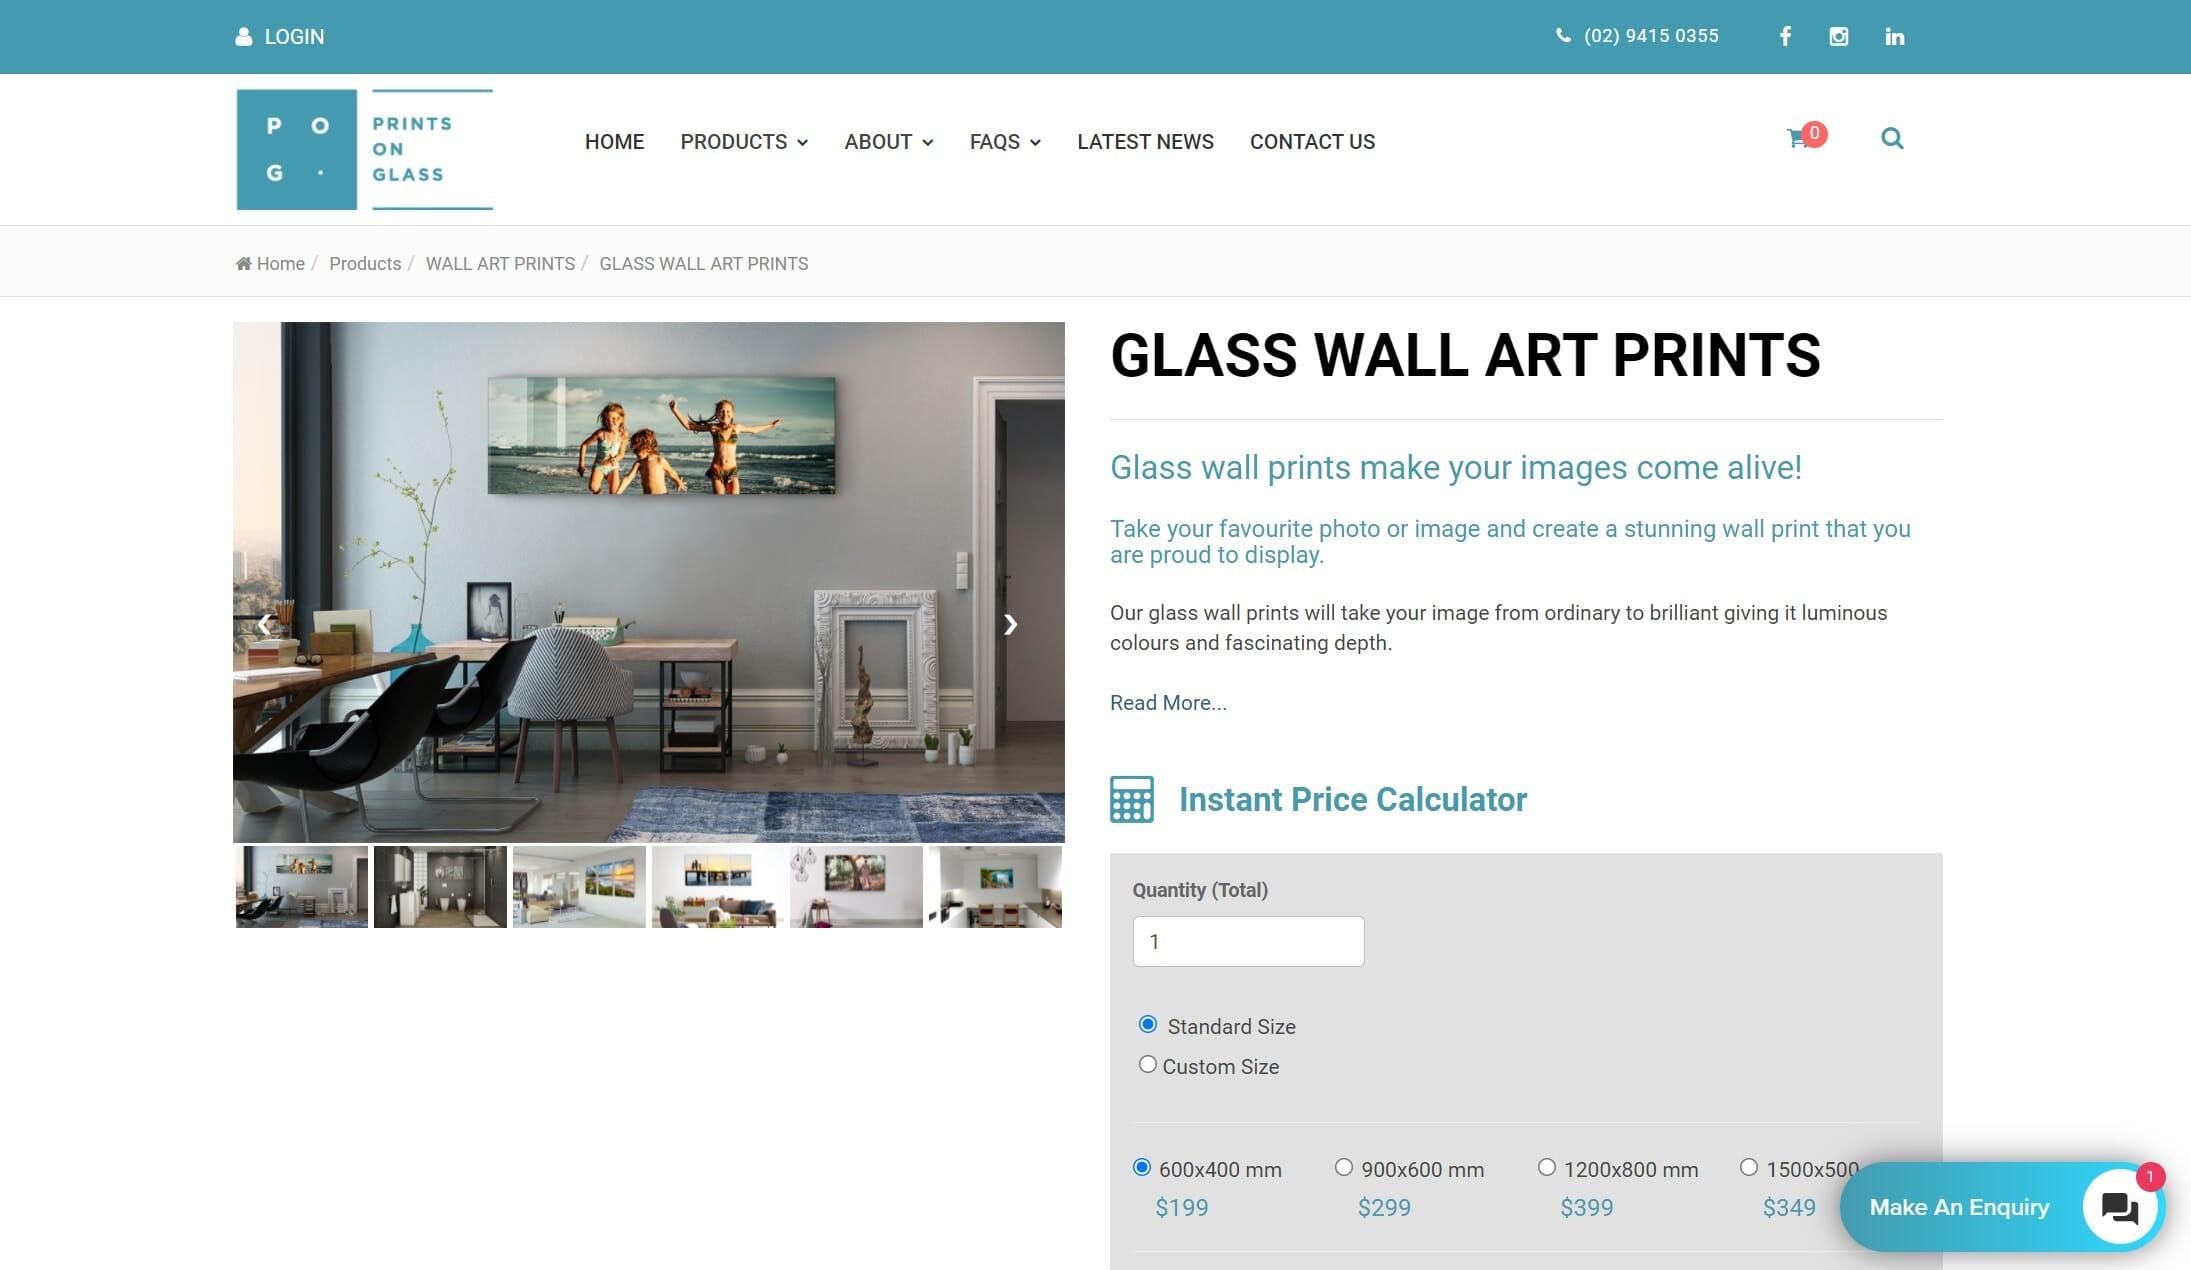 Prints on Glass